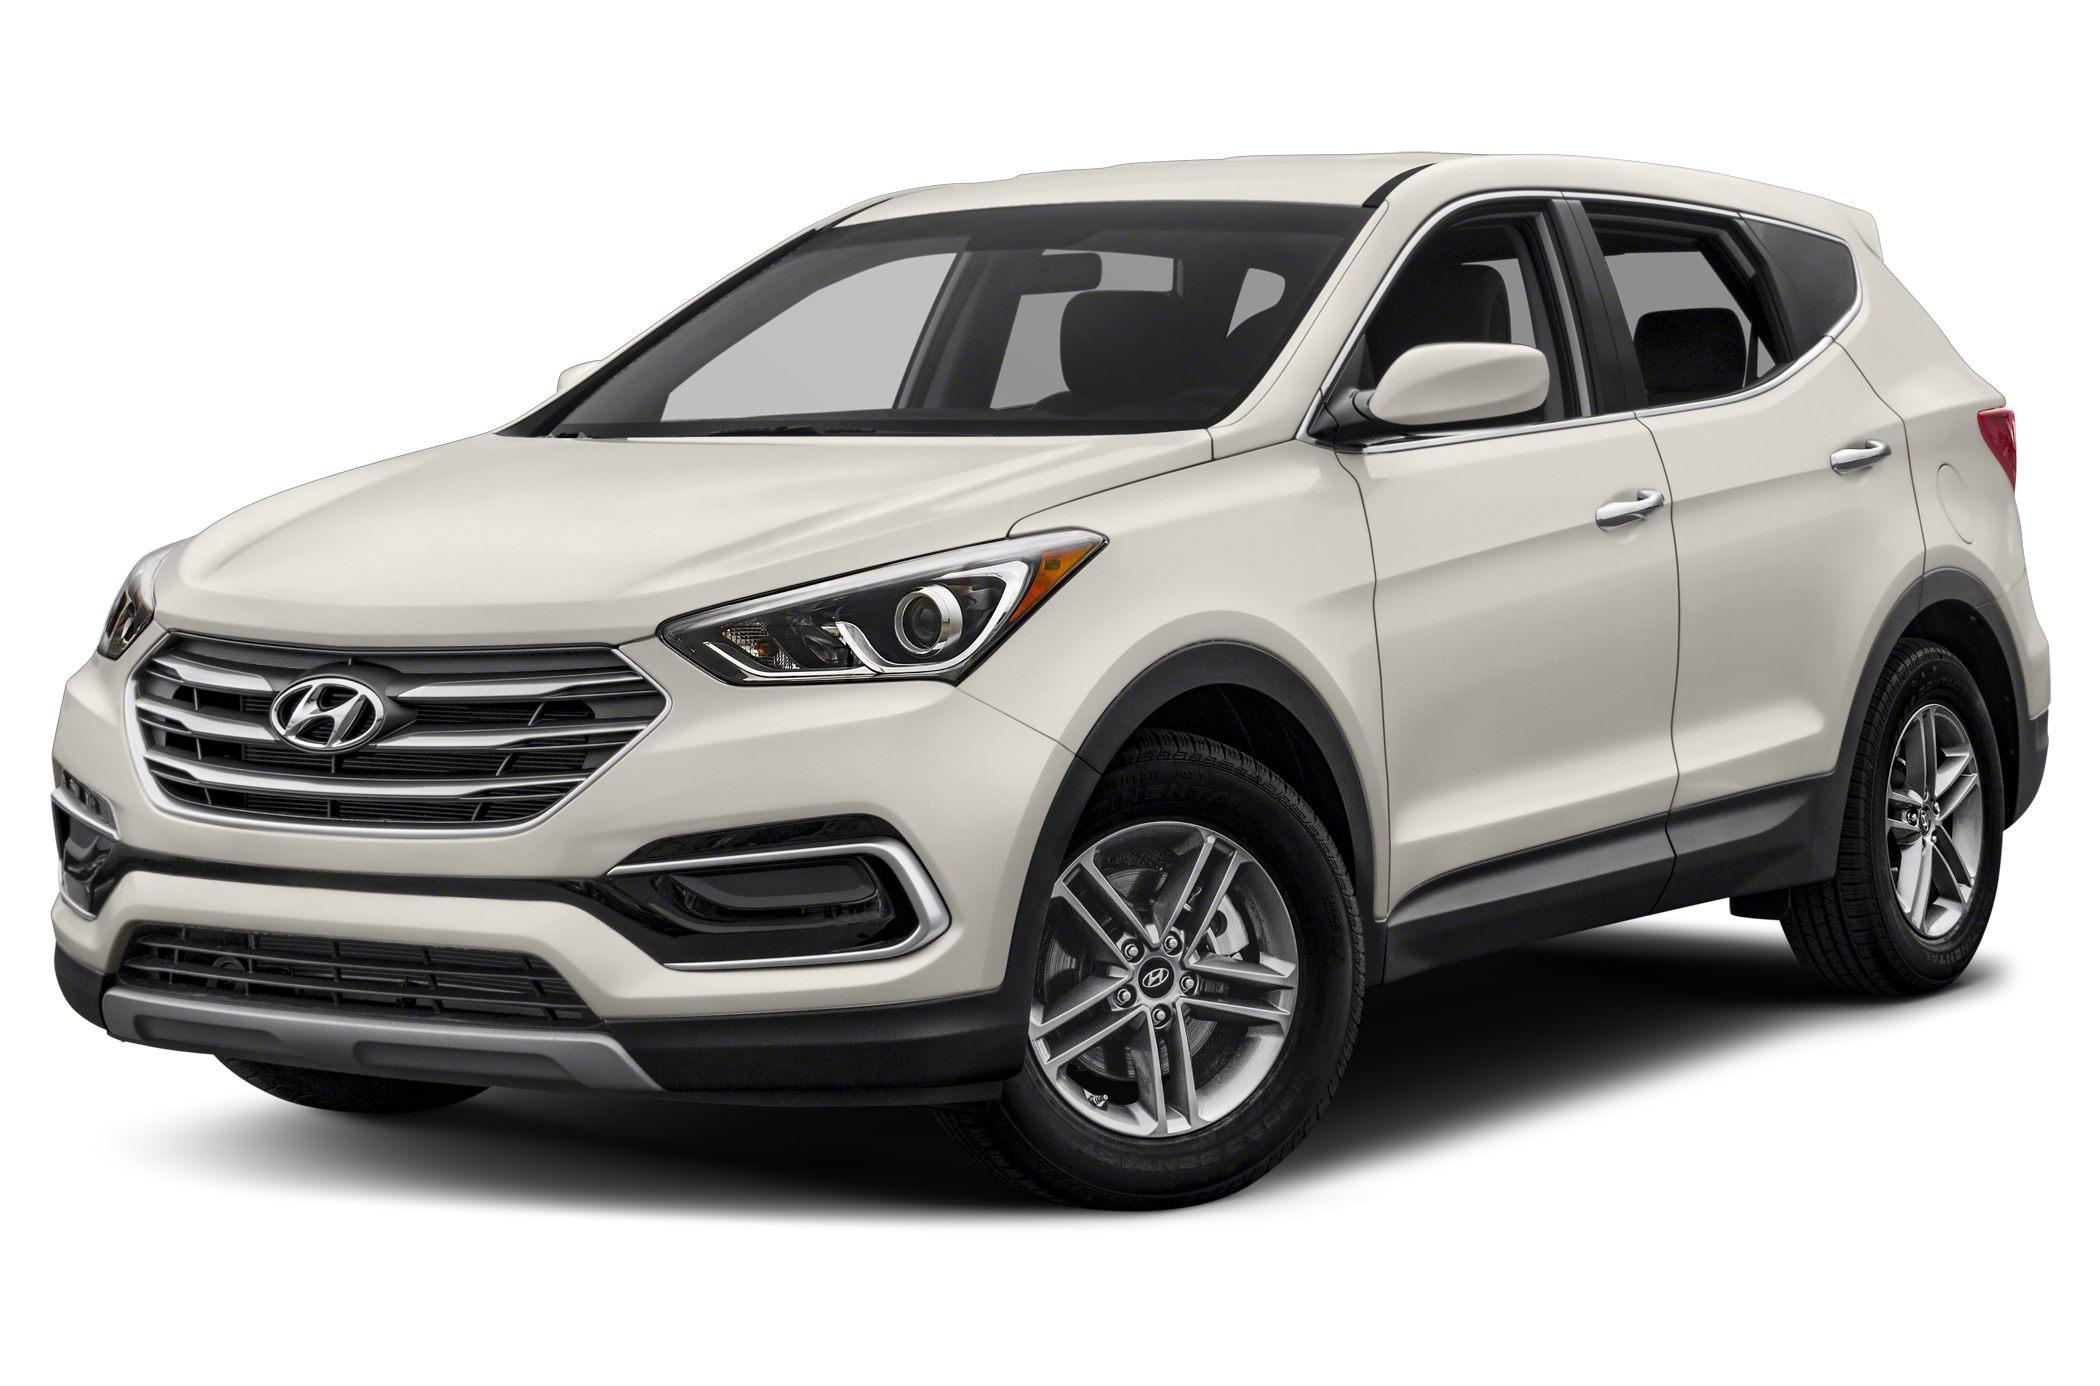 2018 Hyundai Santa Fe Sport 2 4l 4dr All Wheel Drive Specs And Prices